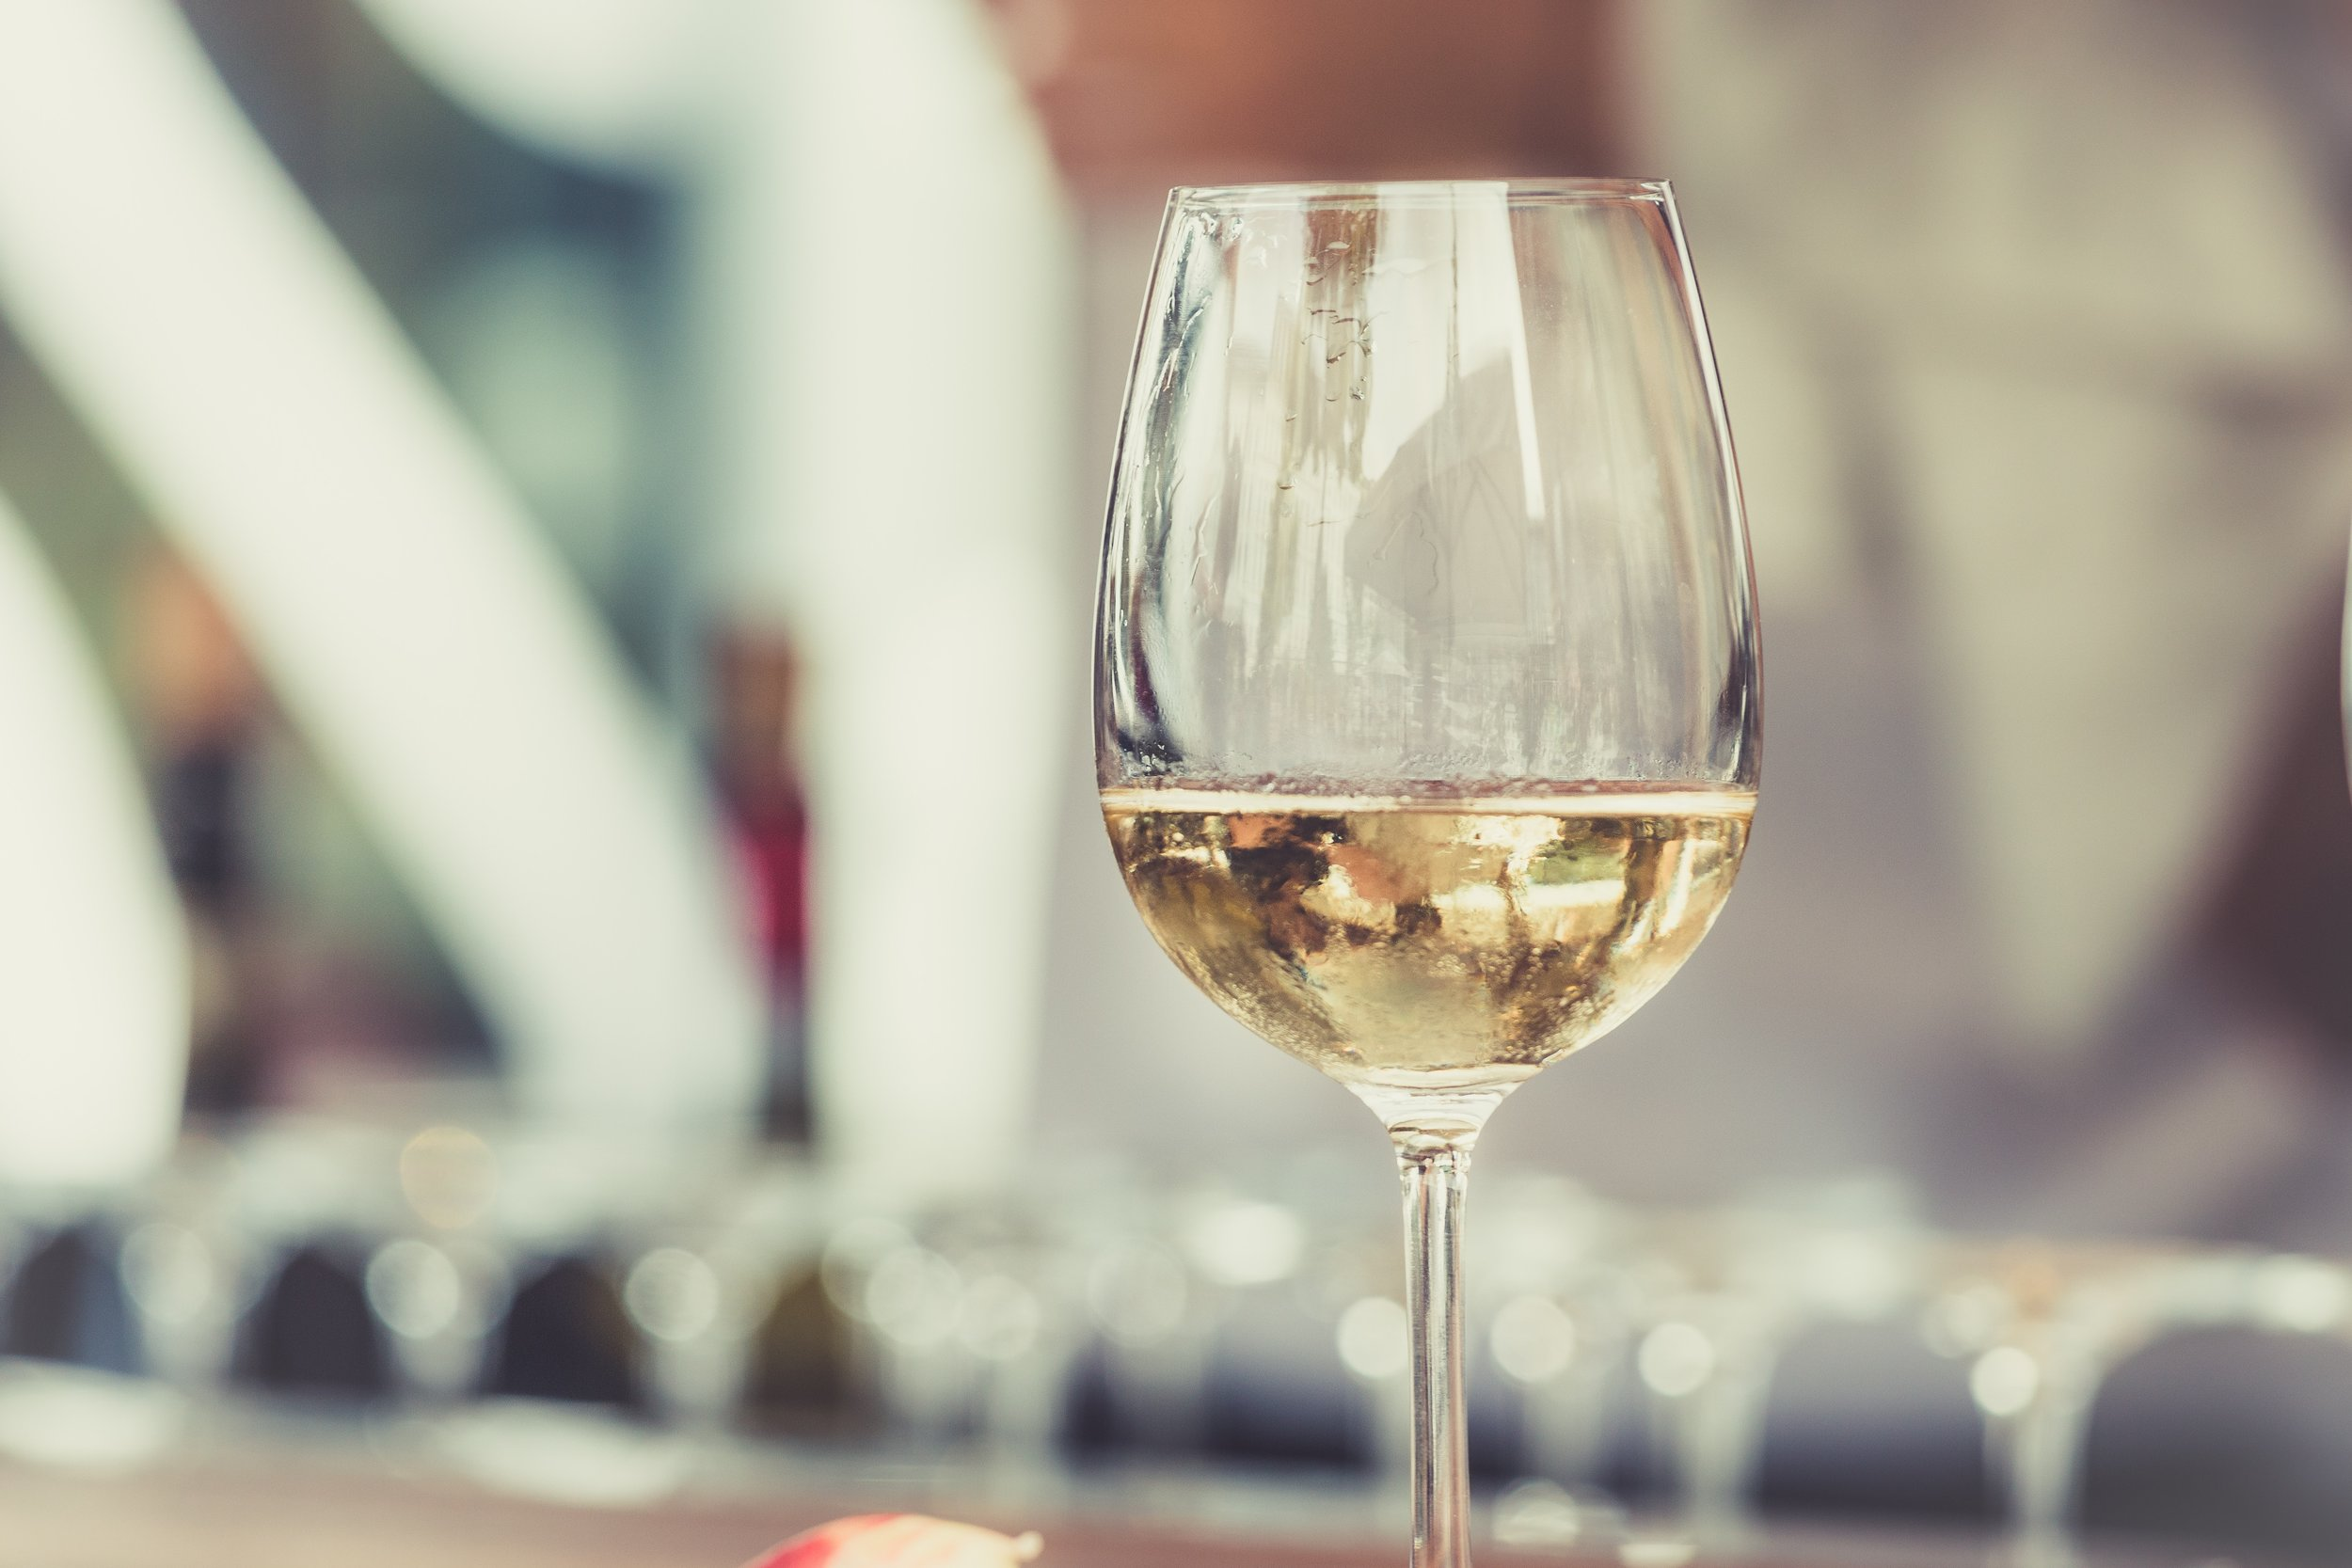 Gracias a mi revisión semanal, por fin pude empezar un curso de vinos!